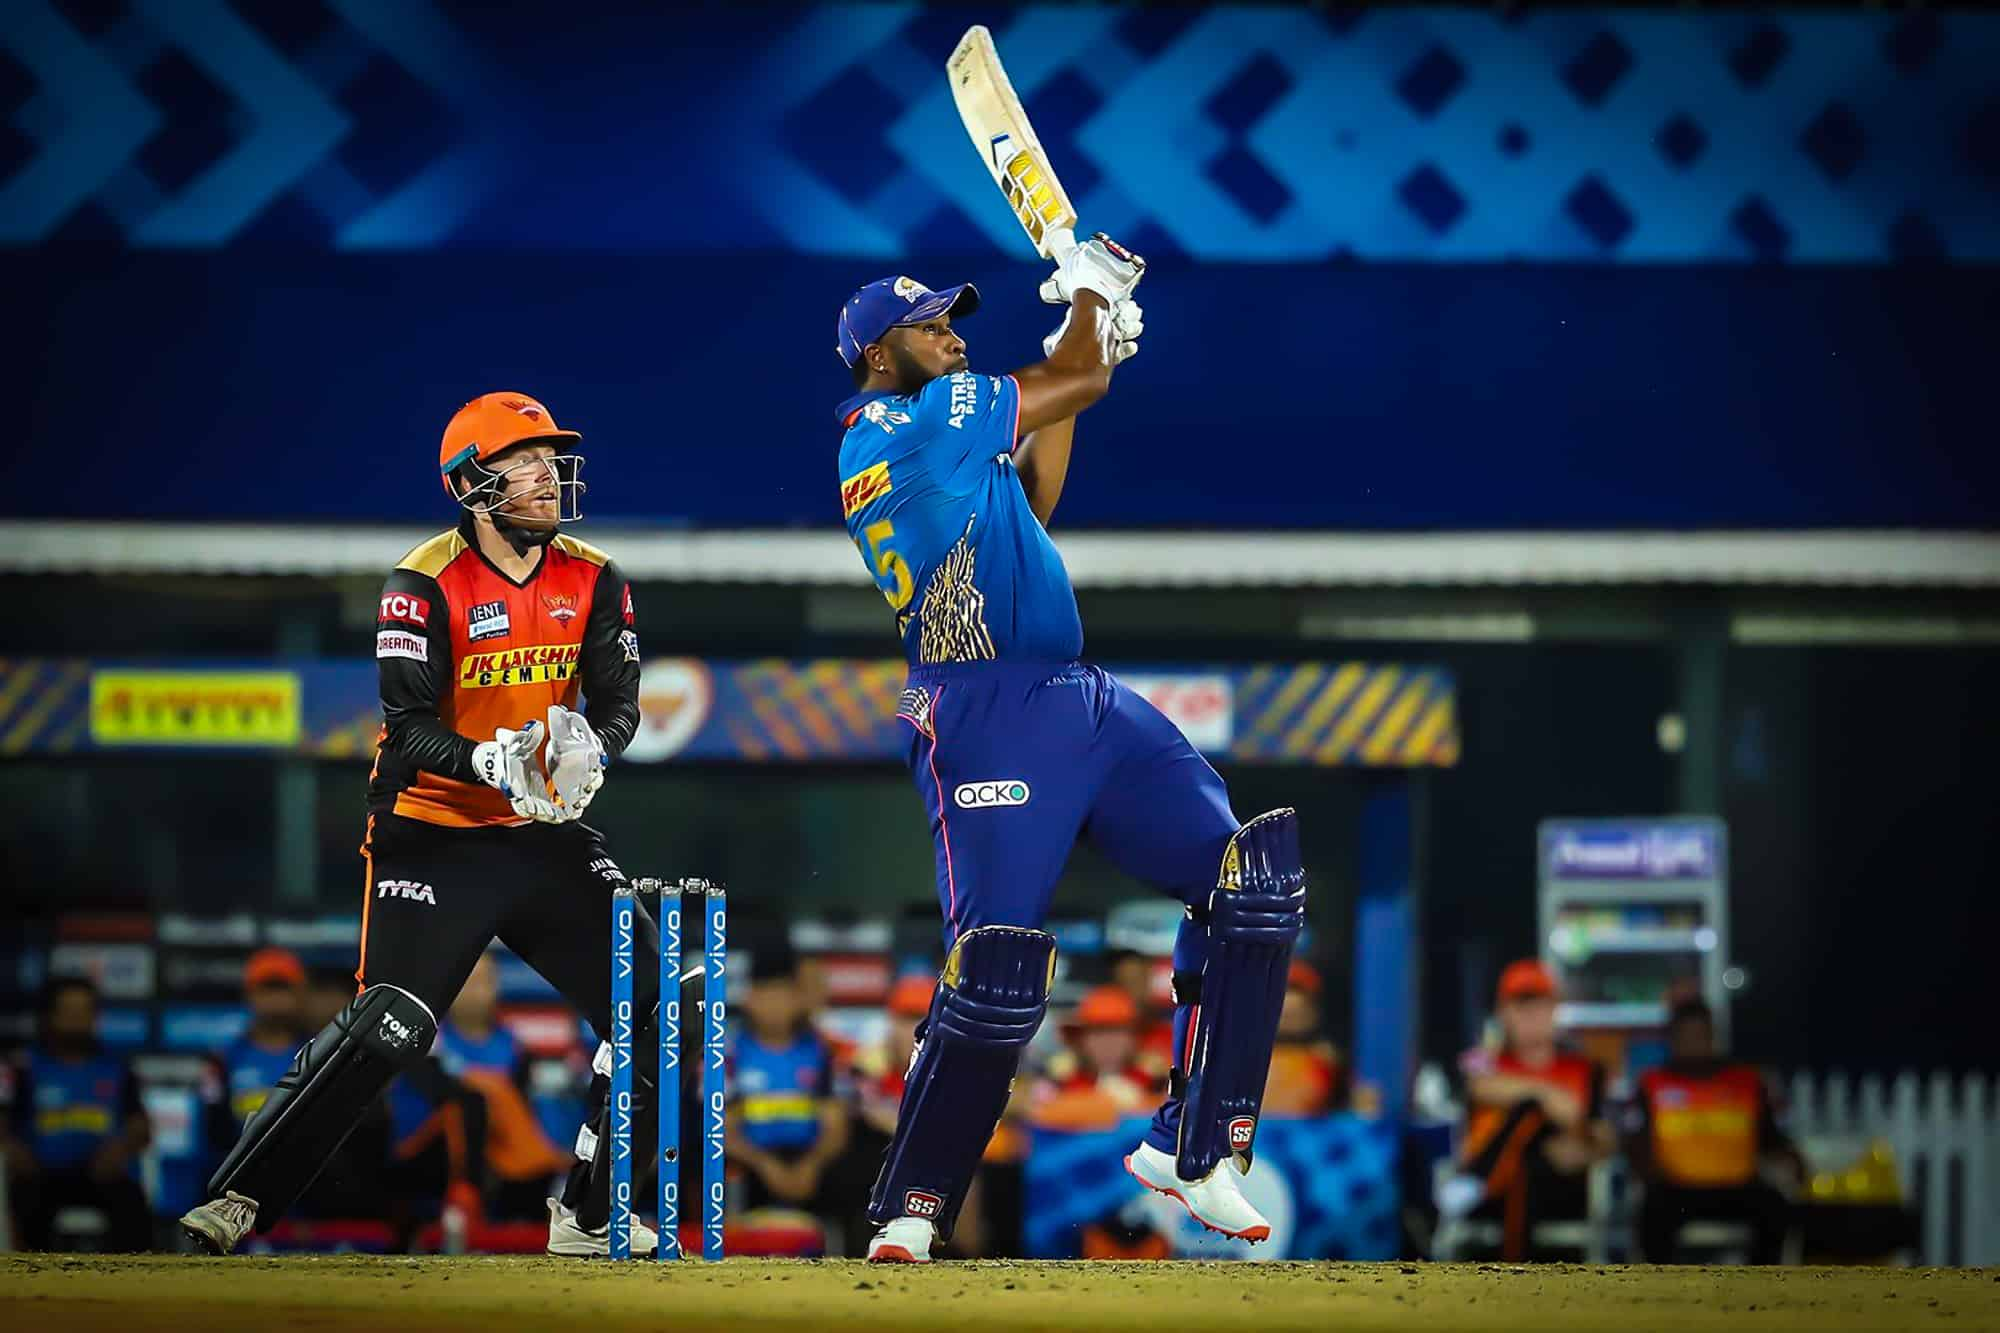 Kieron Pollard Becomes 6th Batsman With 200-Plus Sixes in IPL